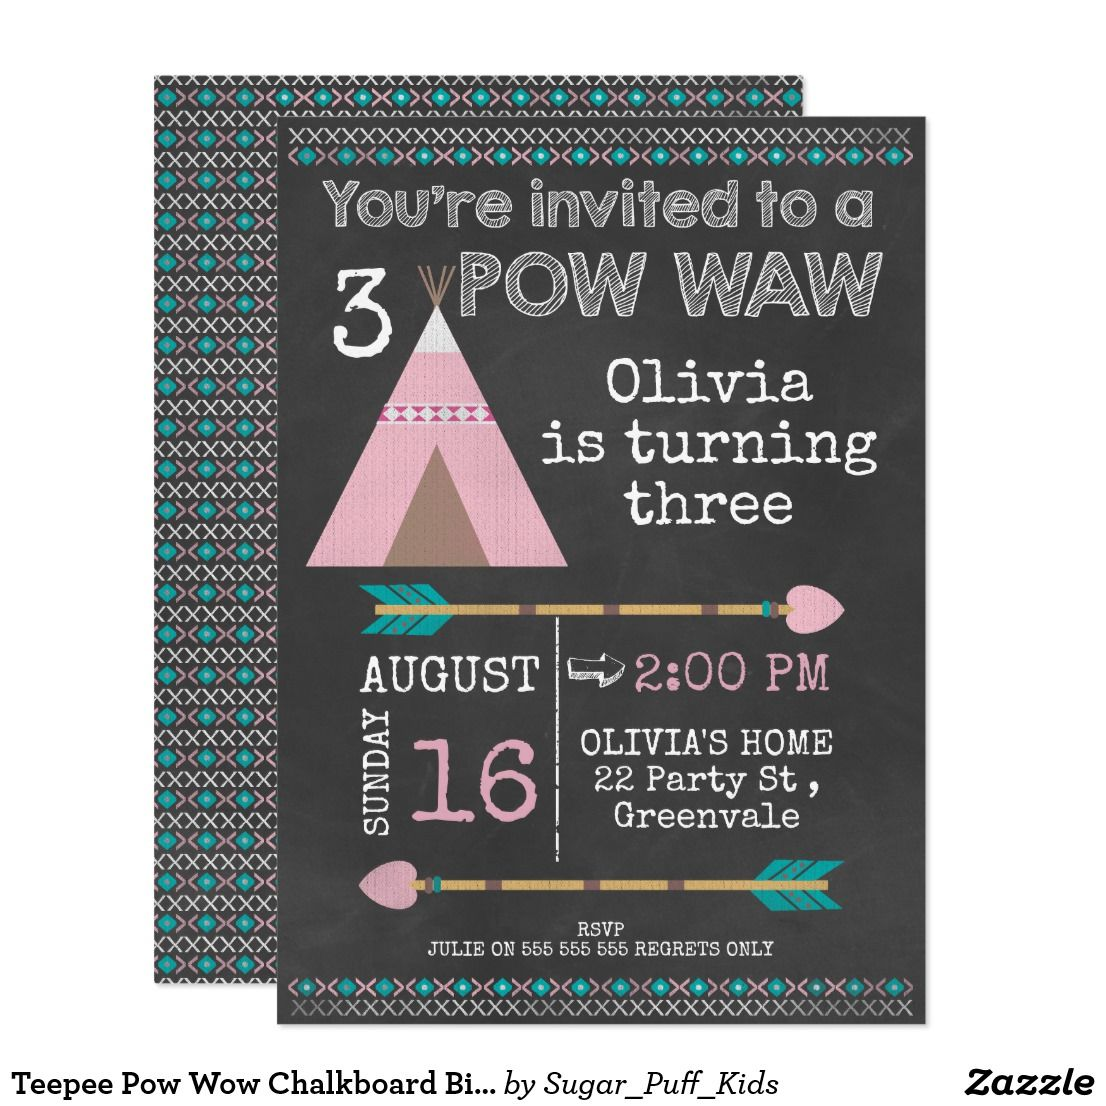 Teepee pow wow chalkboard birthday invitation chalkboard teepee pow wow chalkboard birthday invitation filmwisefo